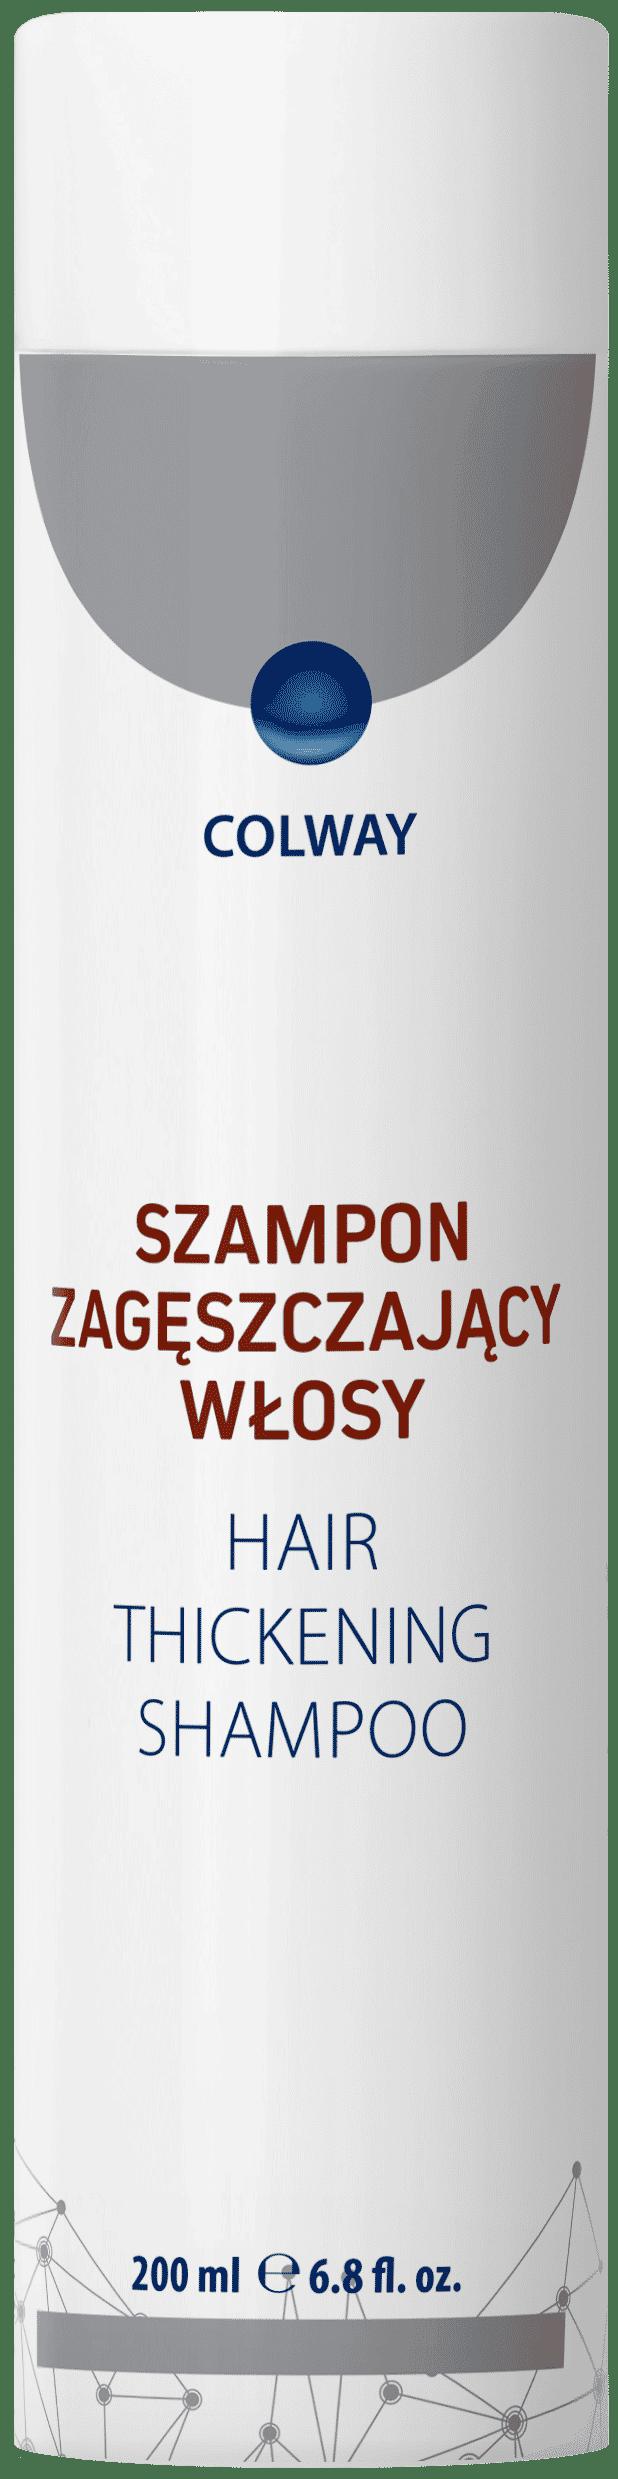 szampon Colway